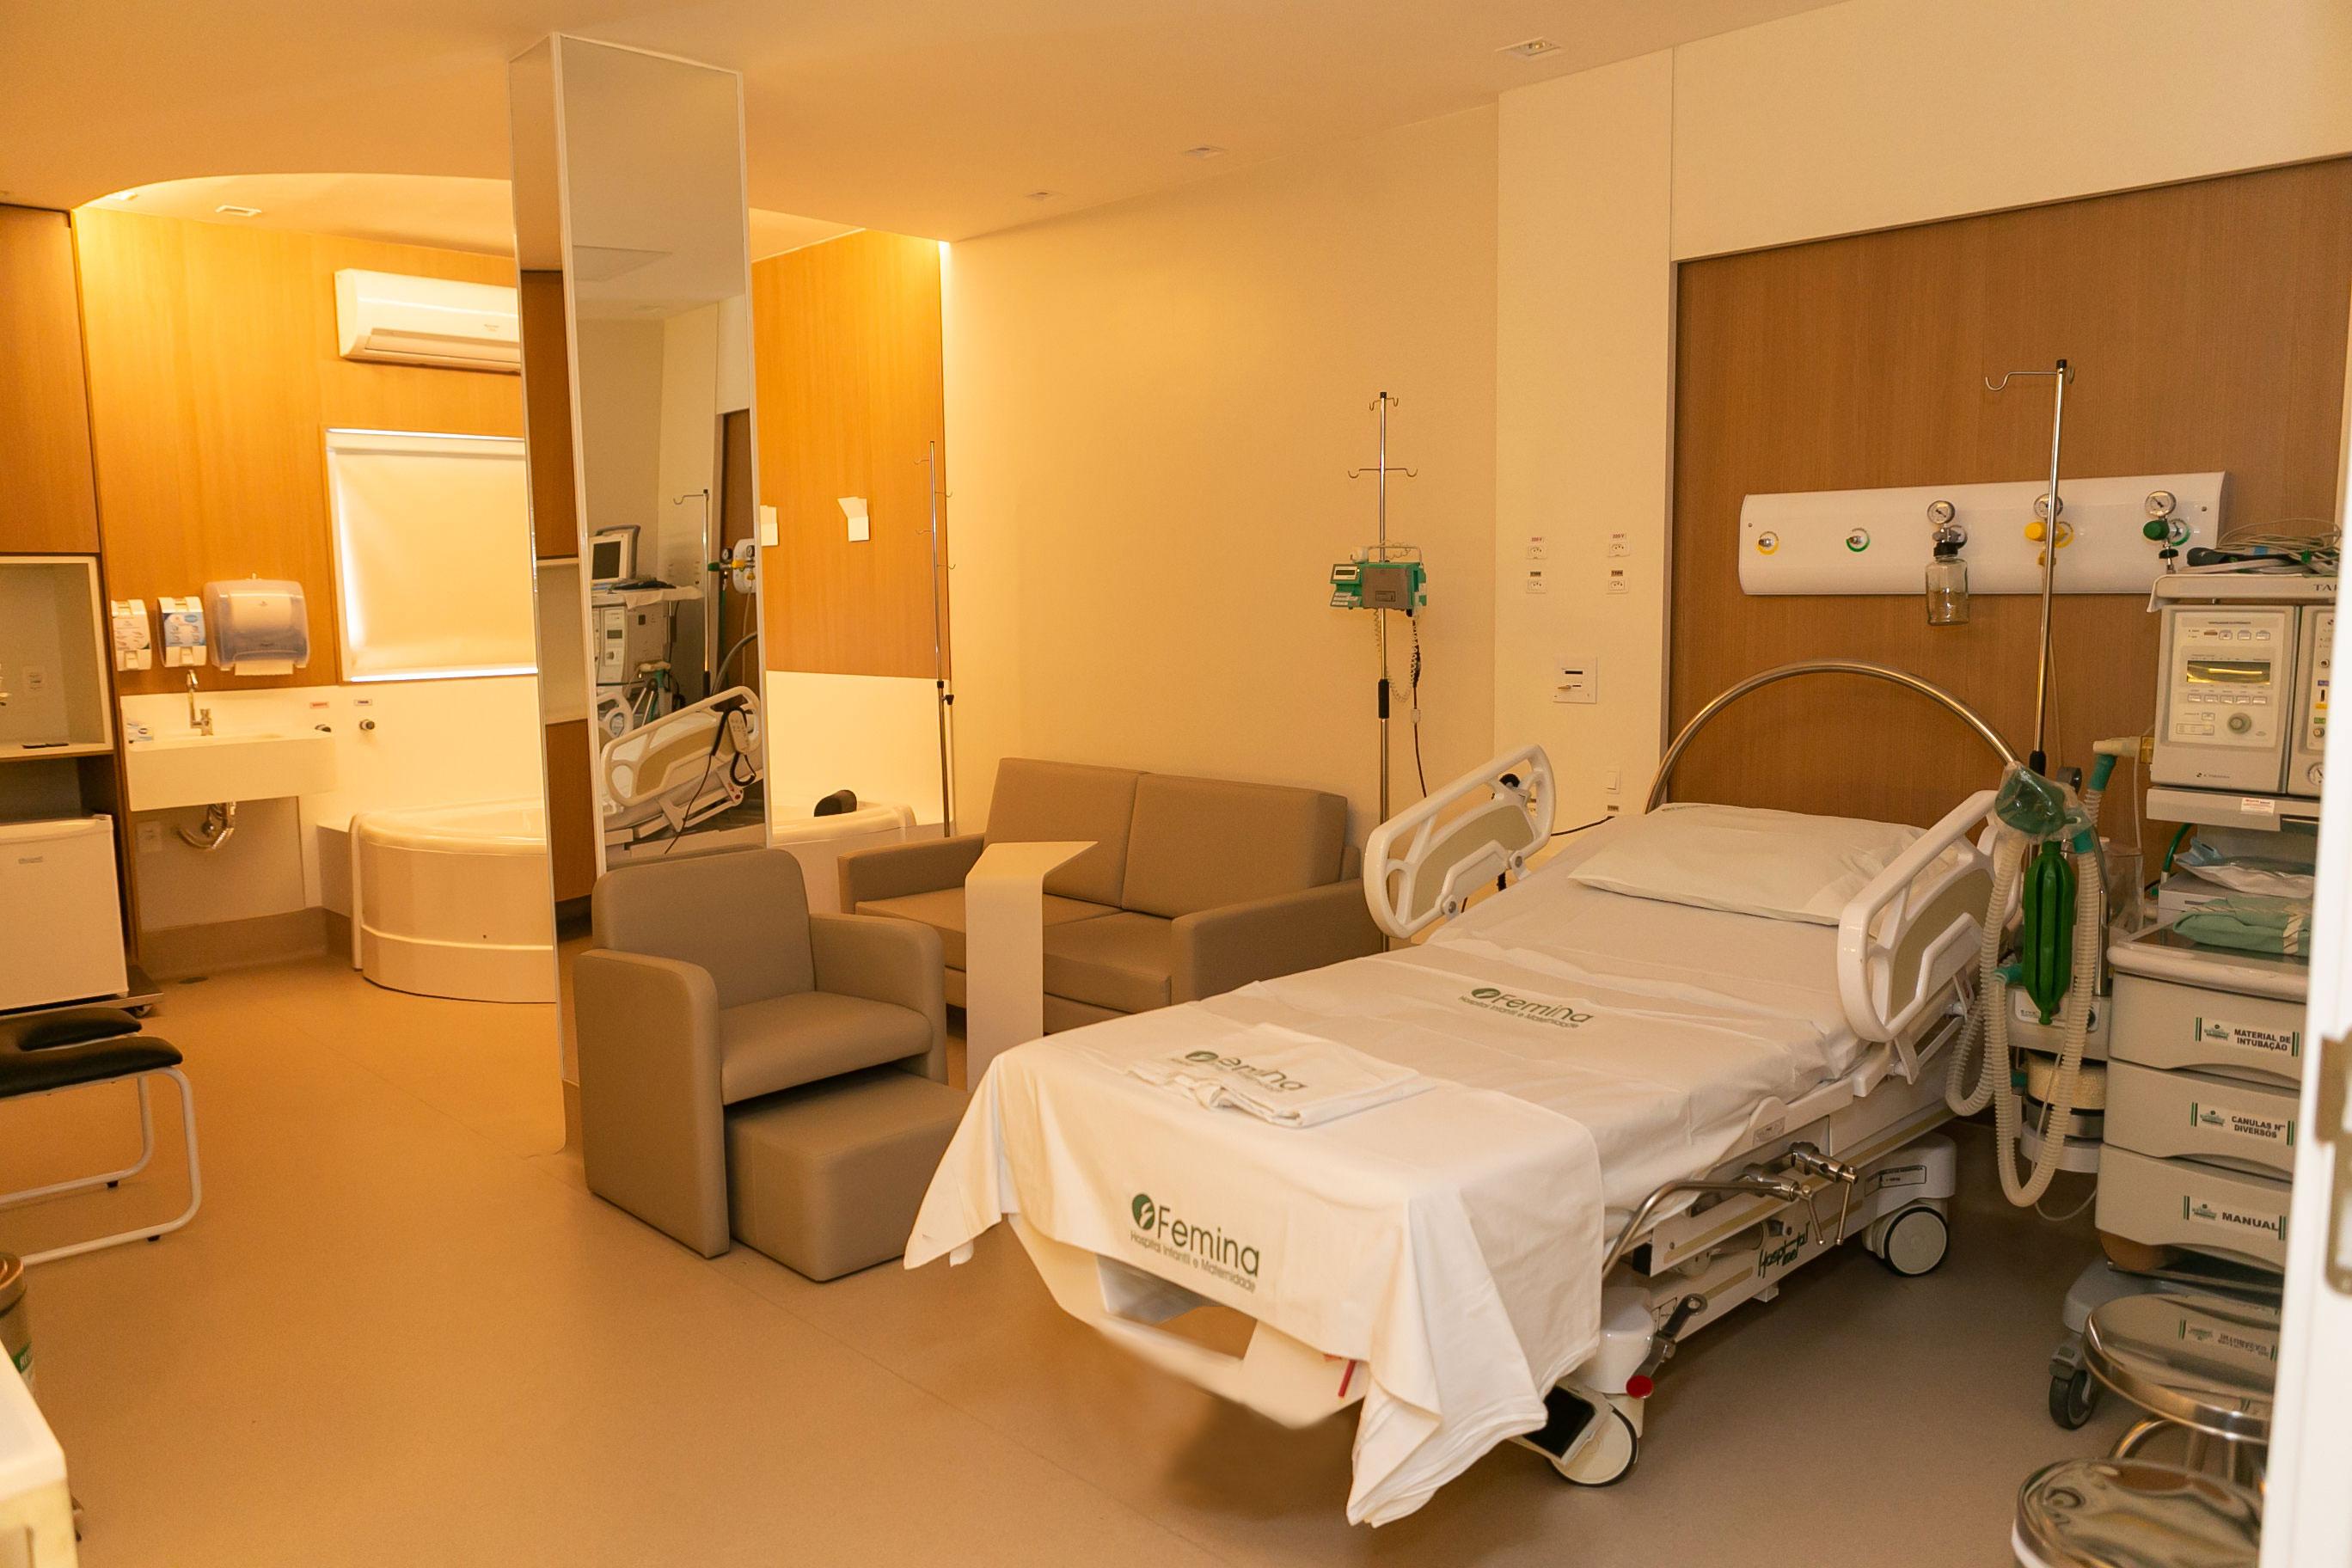 Femina volta a disponibilizar sala especial para parto humanizado